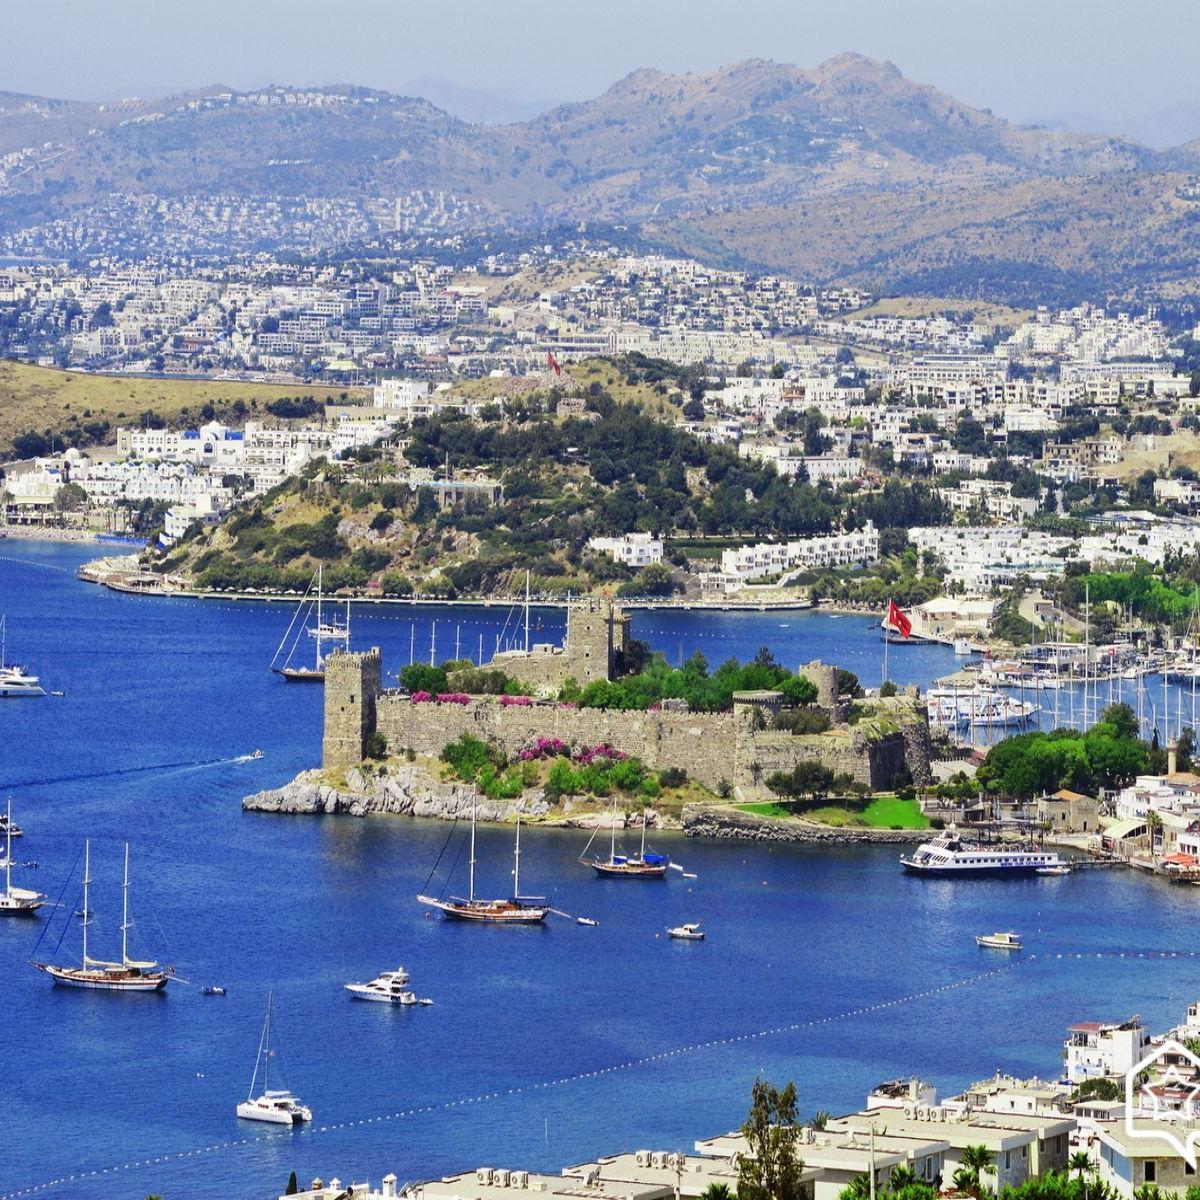 Bodrum, Türkei: 6 Nächte, 2 Personen inkl. Flüge & Transfer ab 91 € pP (Last Minute )